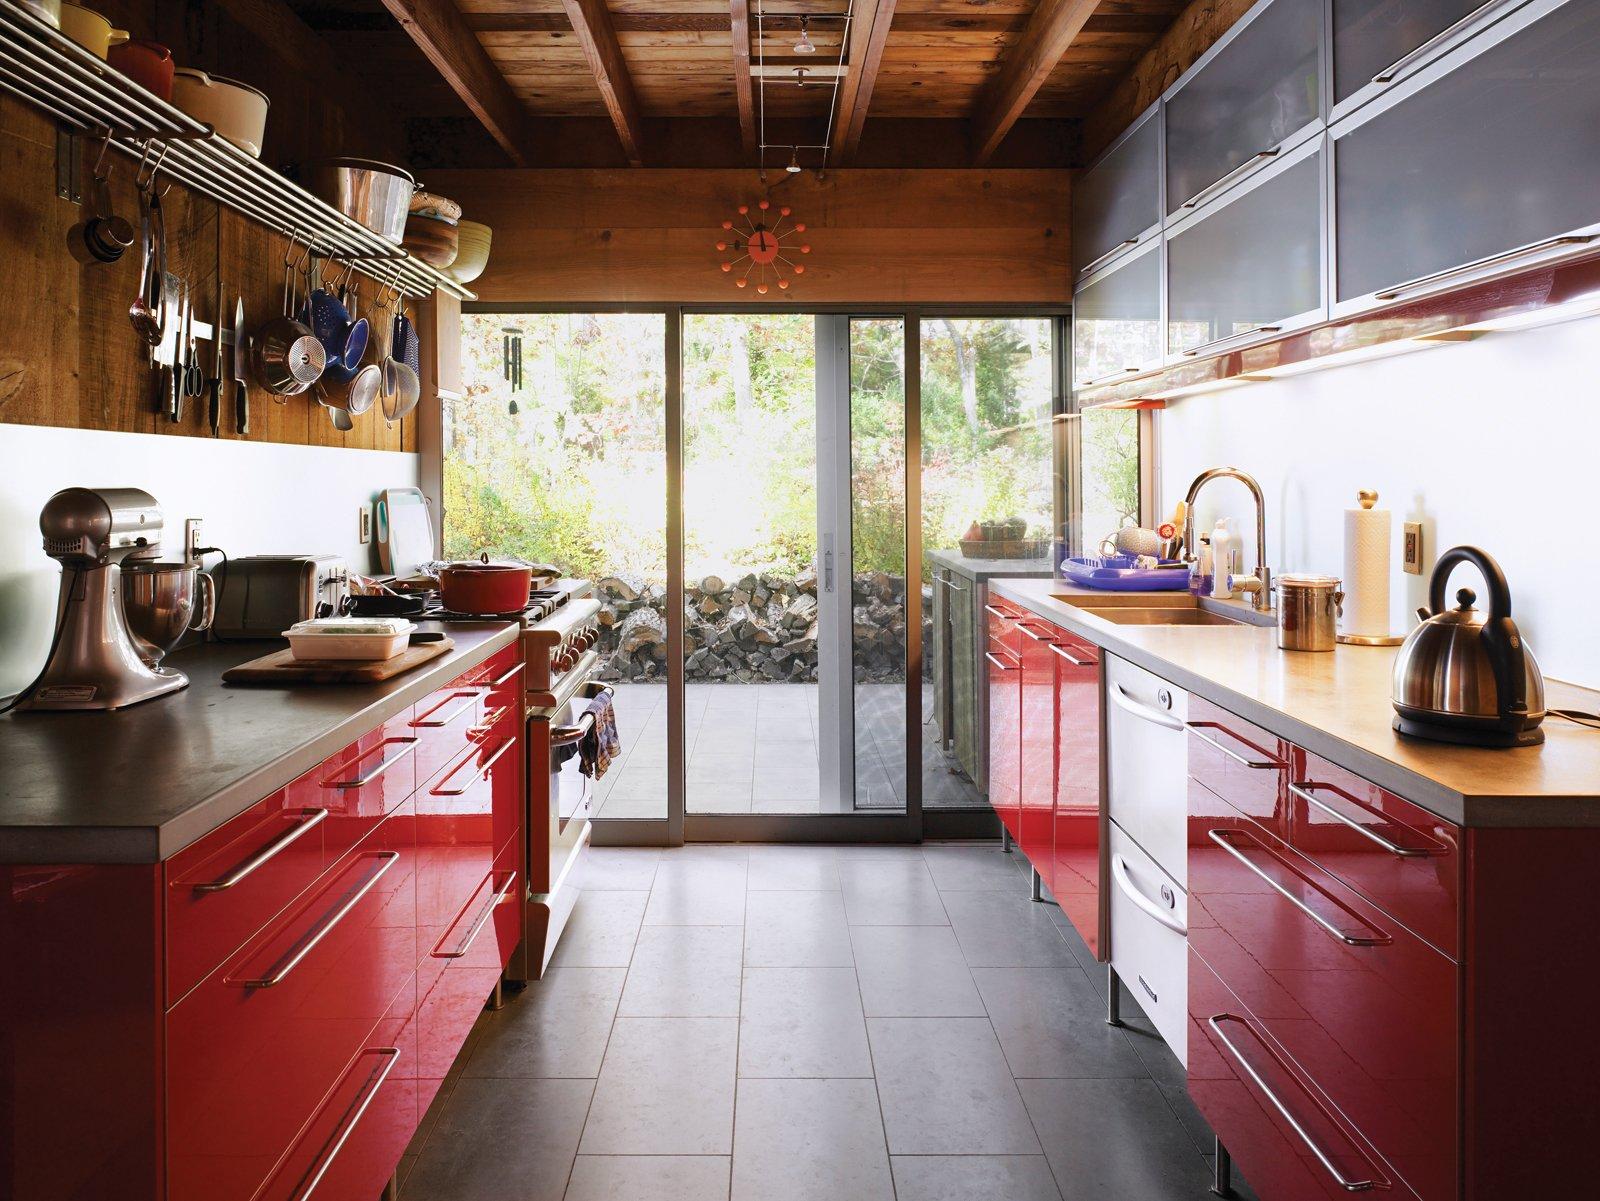 Mississauga kitchen cabinets company